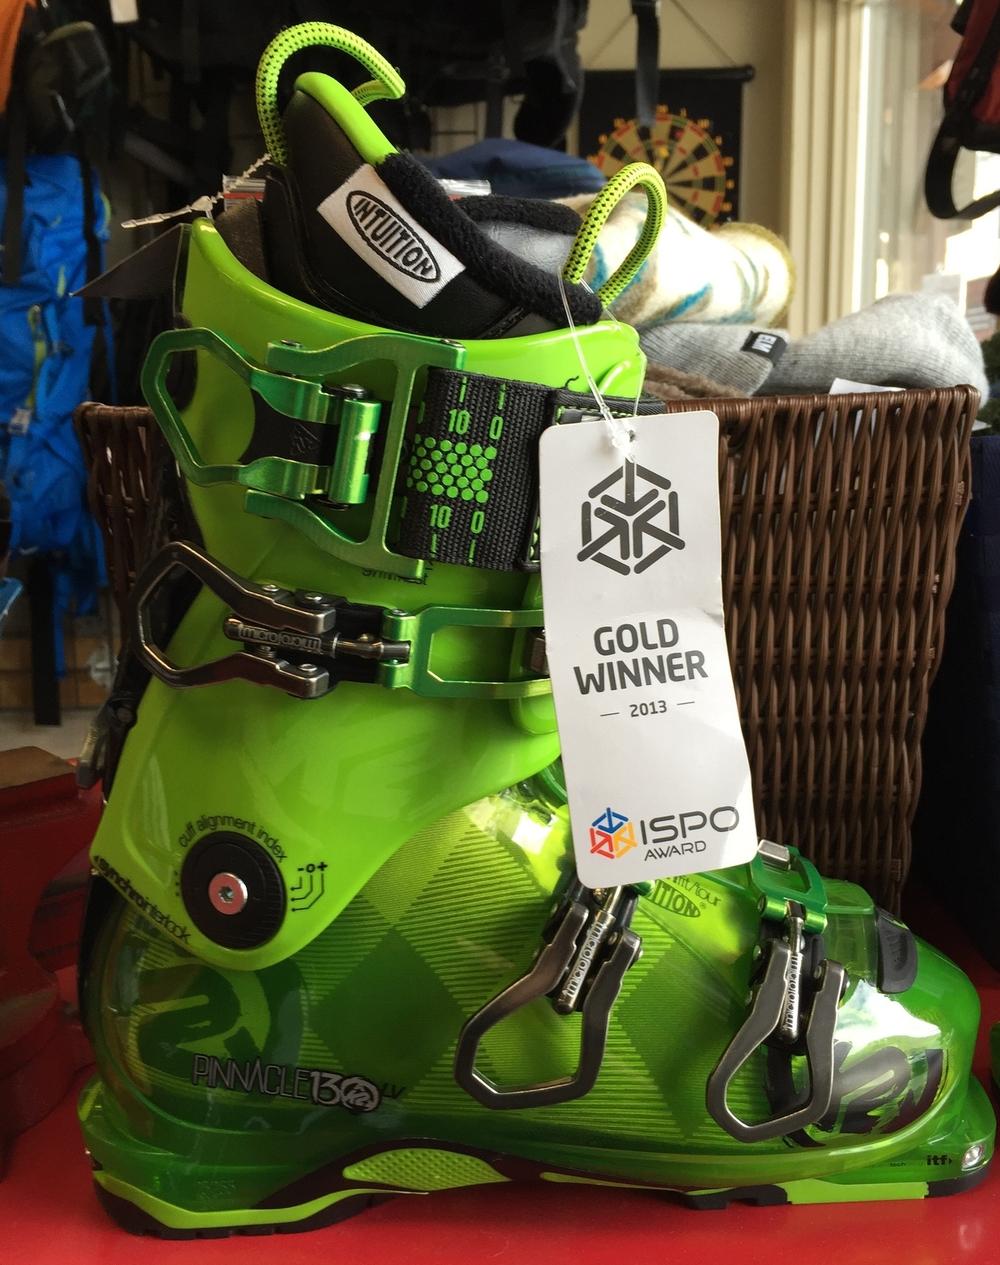 K2 Pinnacle 130 Ski Boot 25/25.5 - $319.20